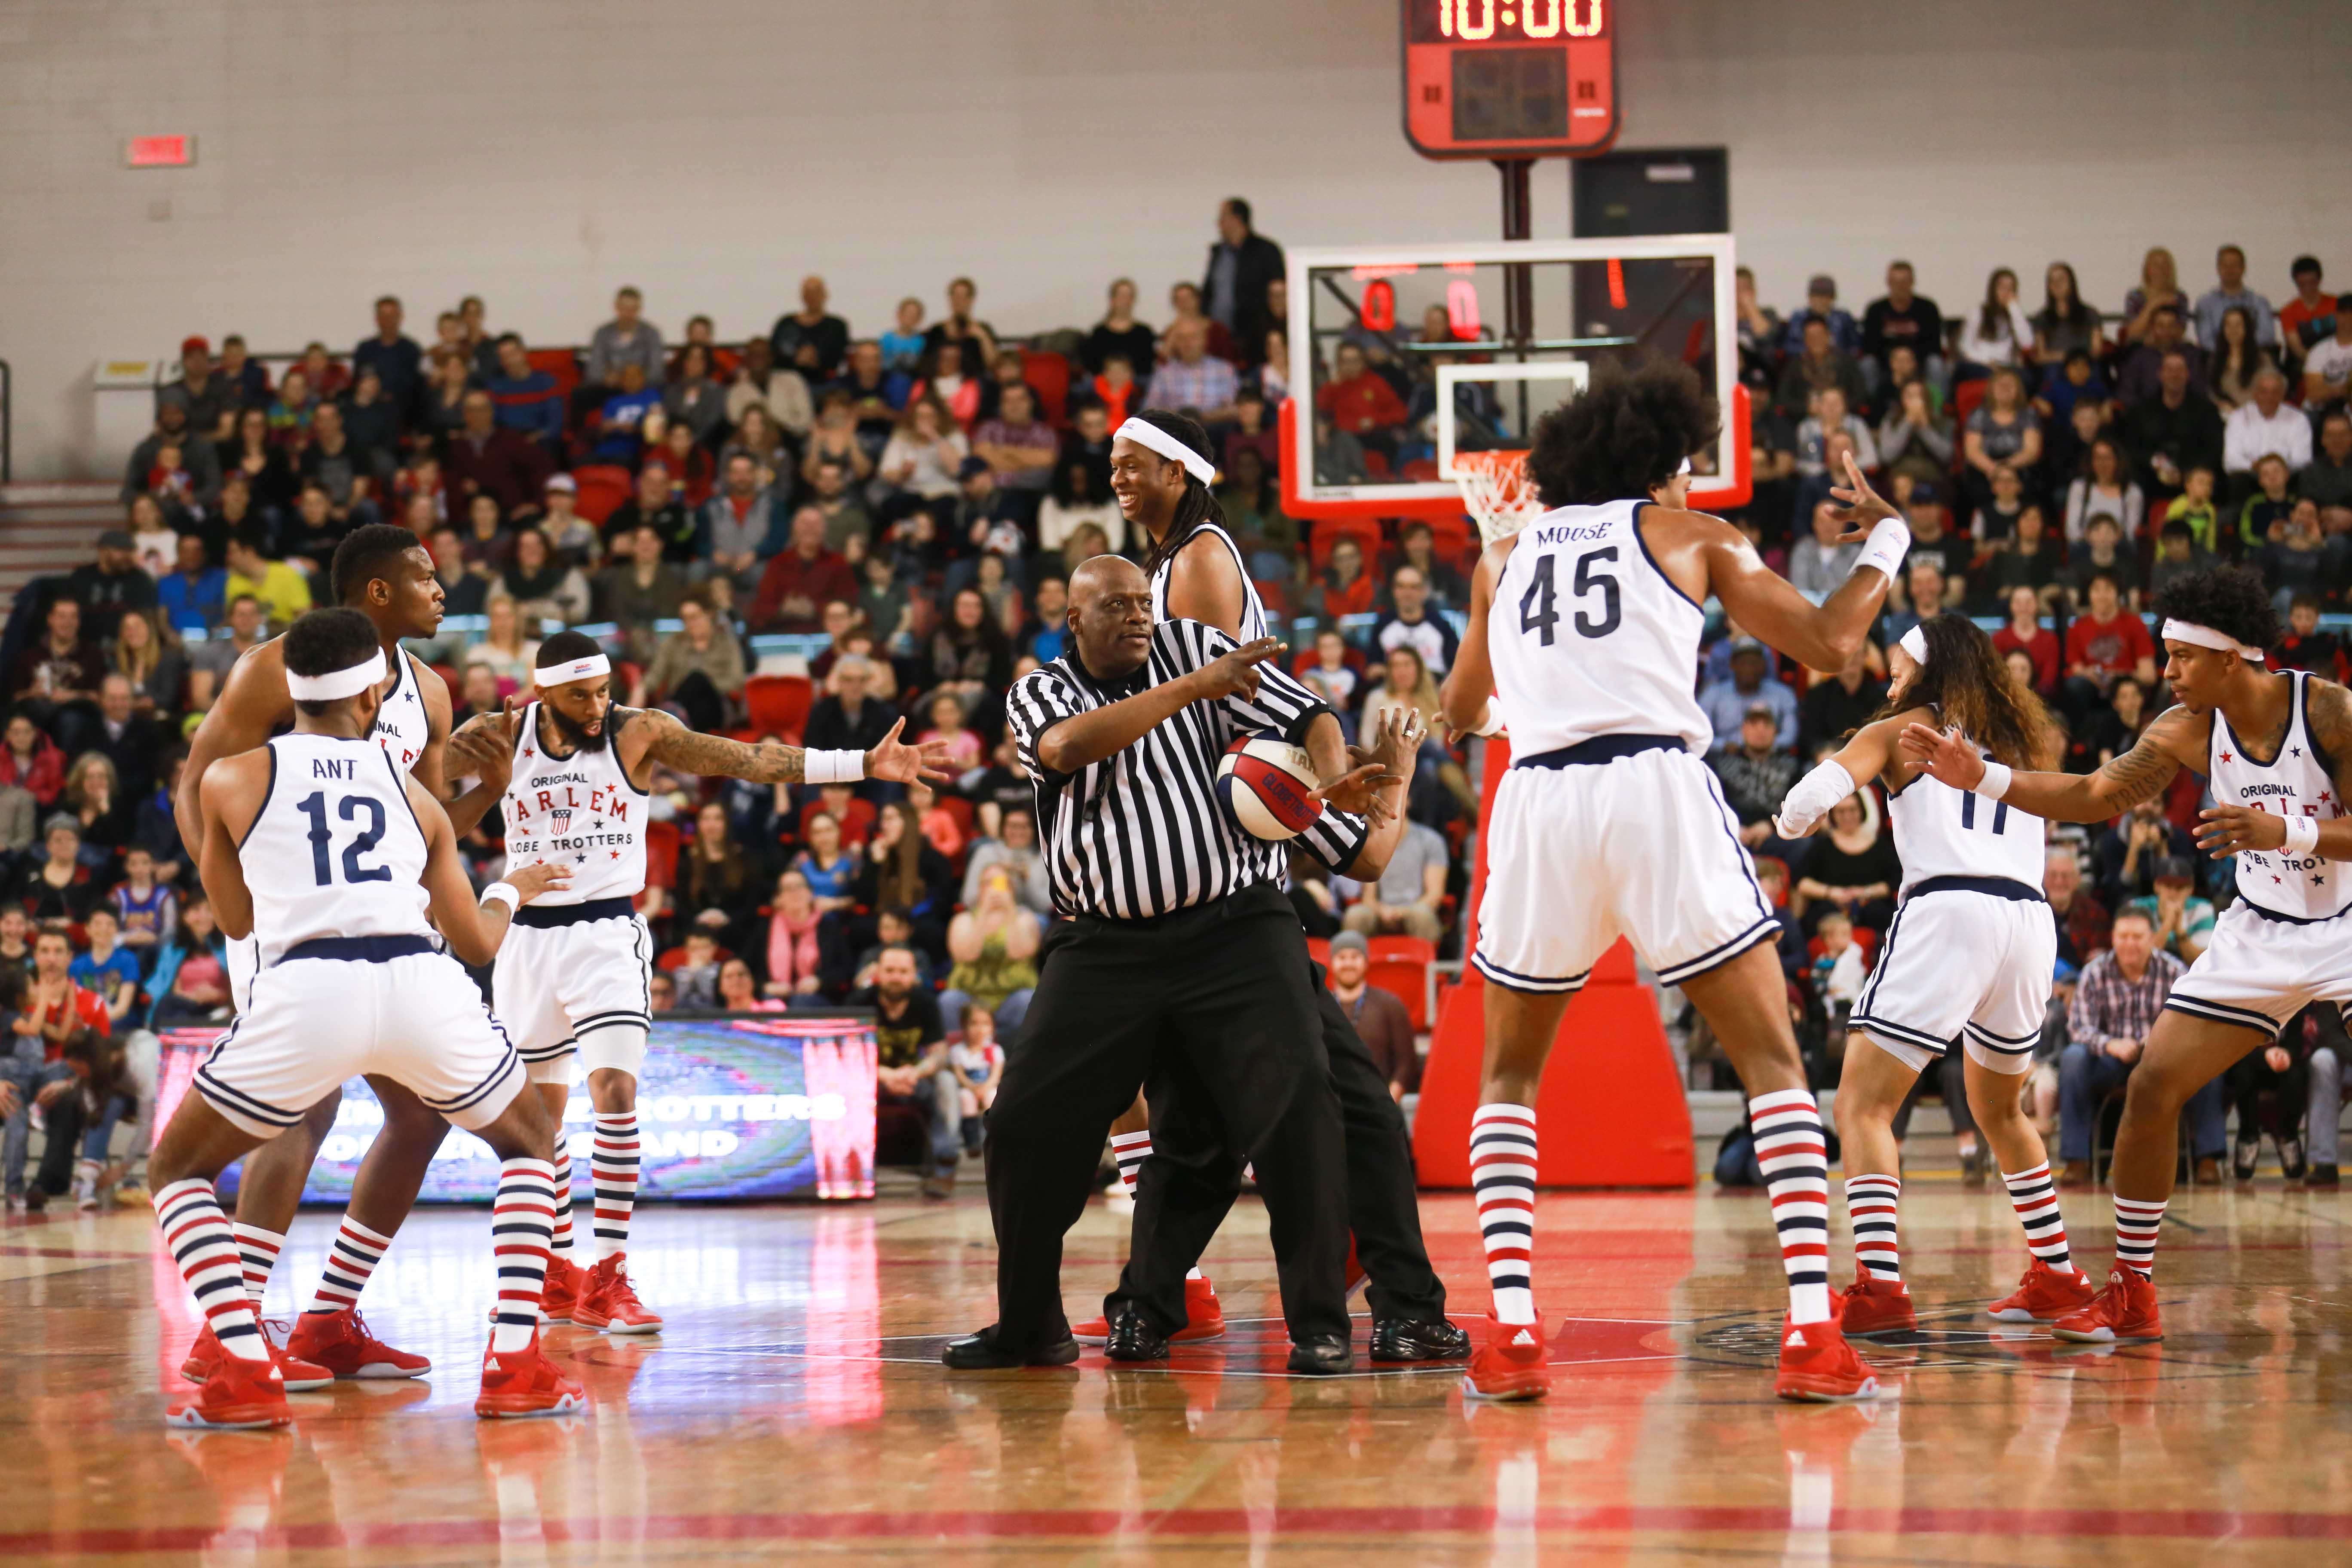 Harlem globetrotters, basketball - Photo : Simon Dufresne